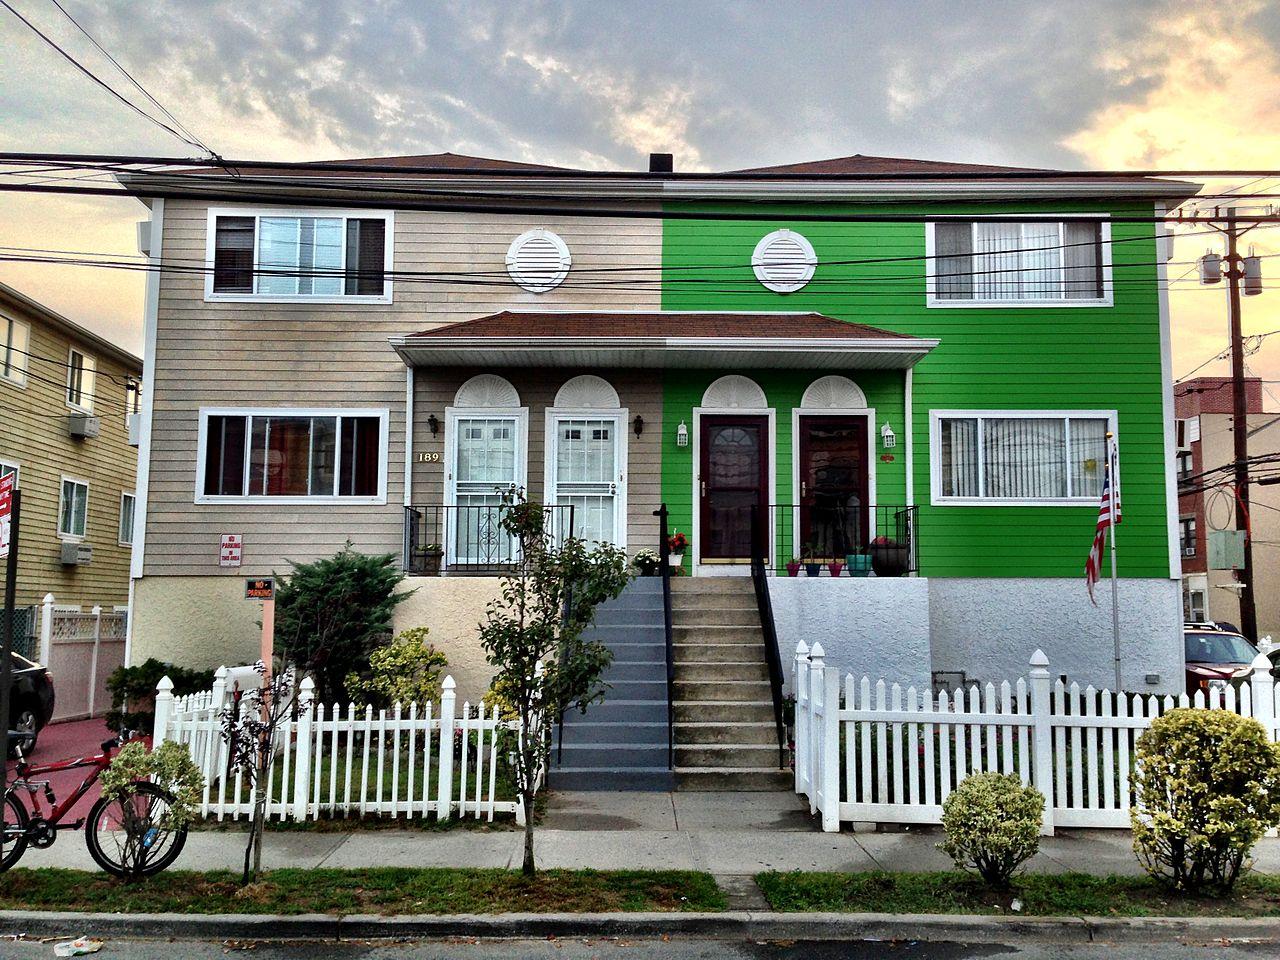 filefar rockaway homes design new york 2013 shankbonejpg - Design Homes Wi